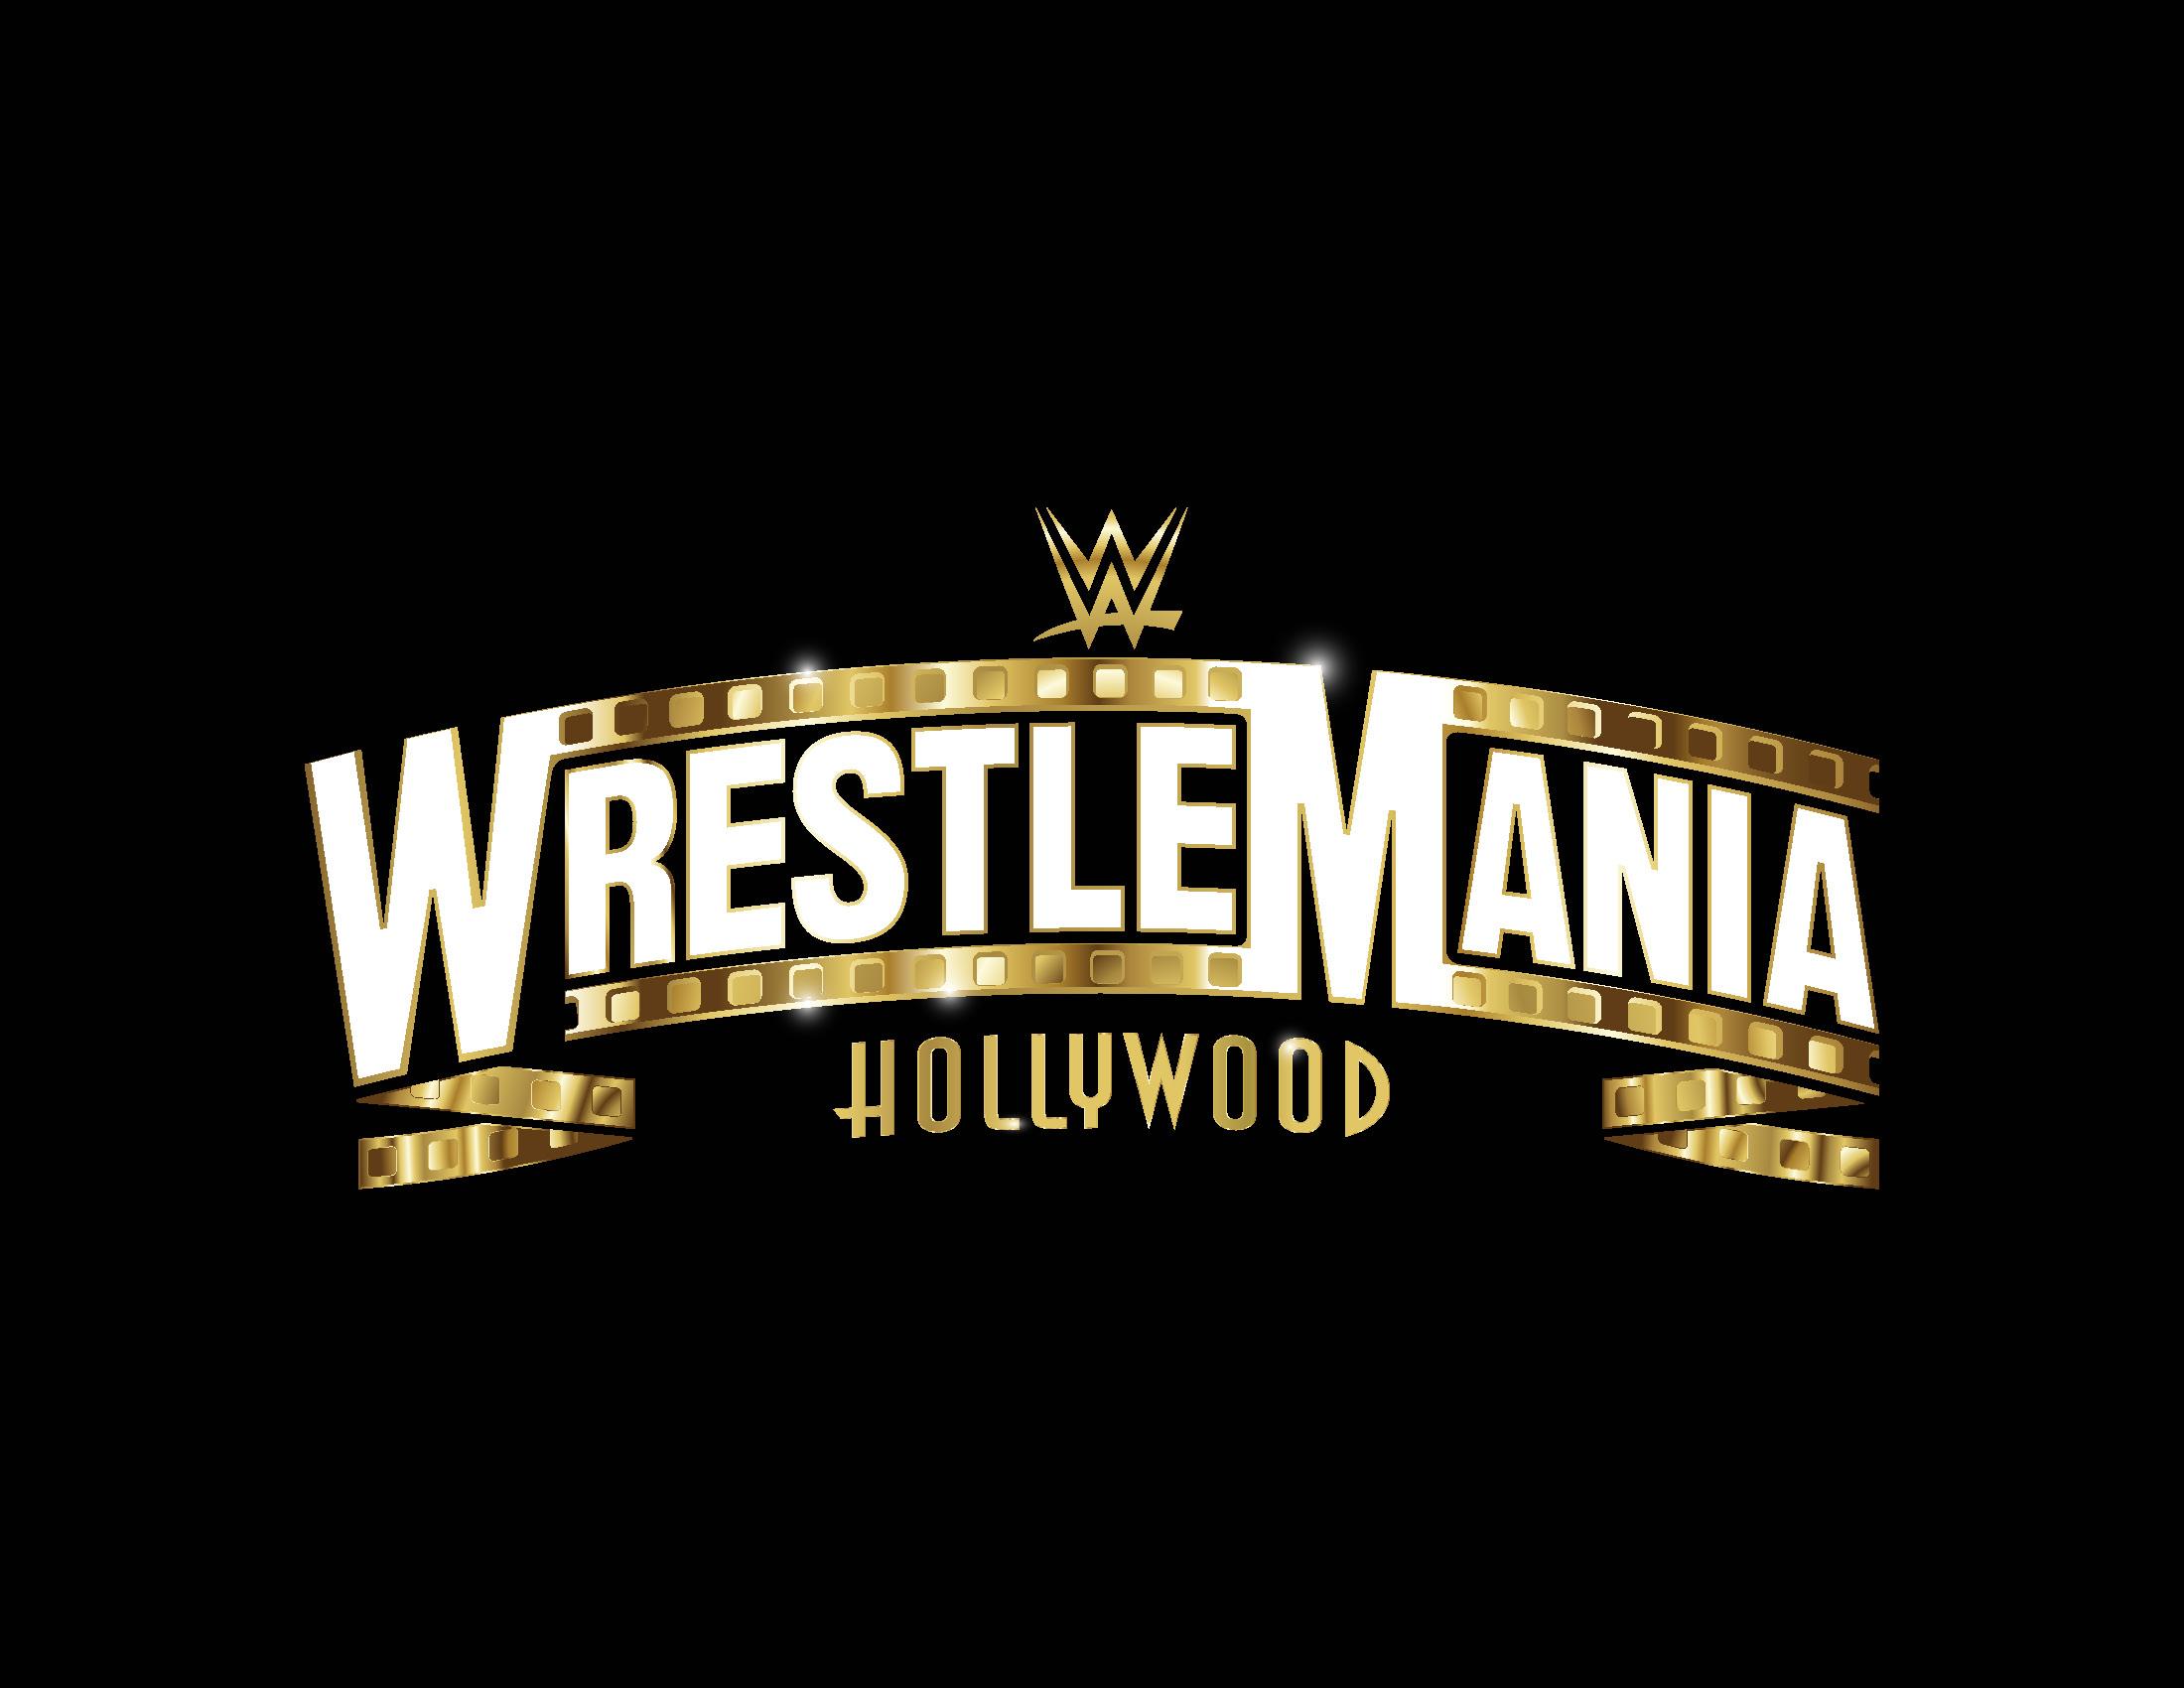 Wwe Wrestlemania 32 Full Show 2021